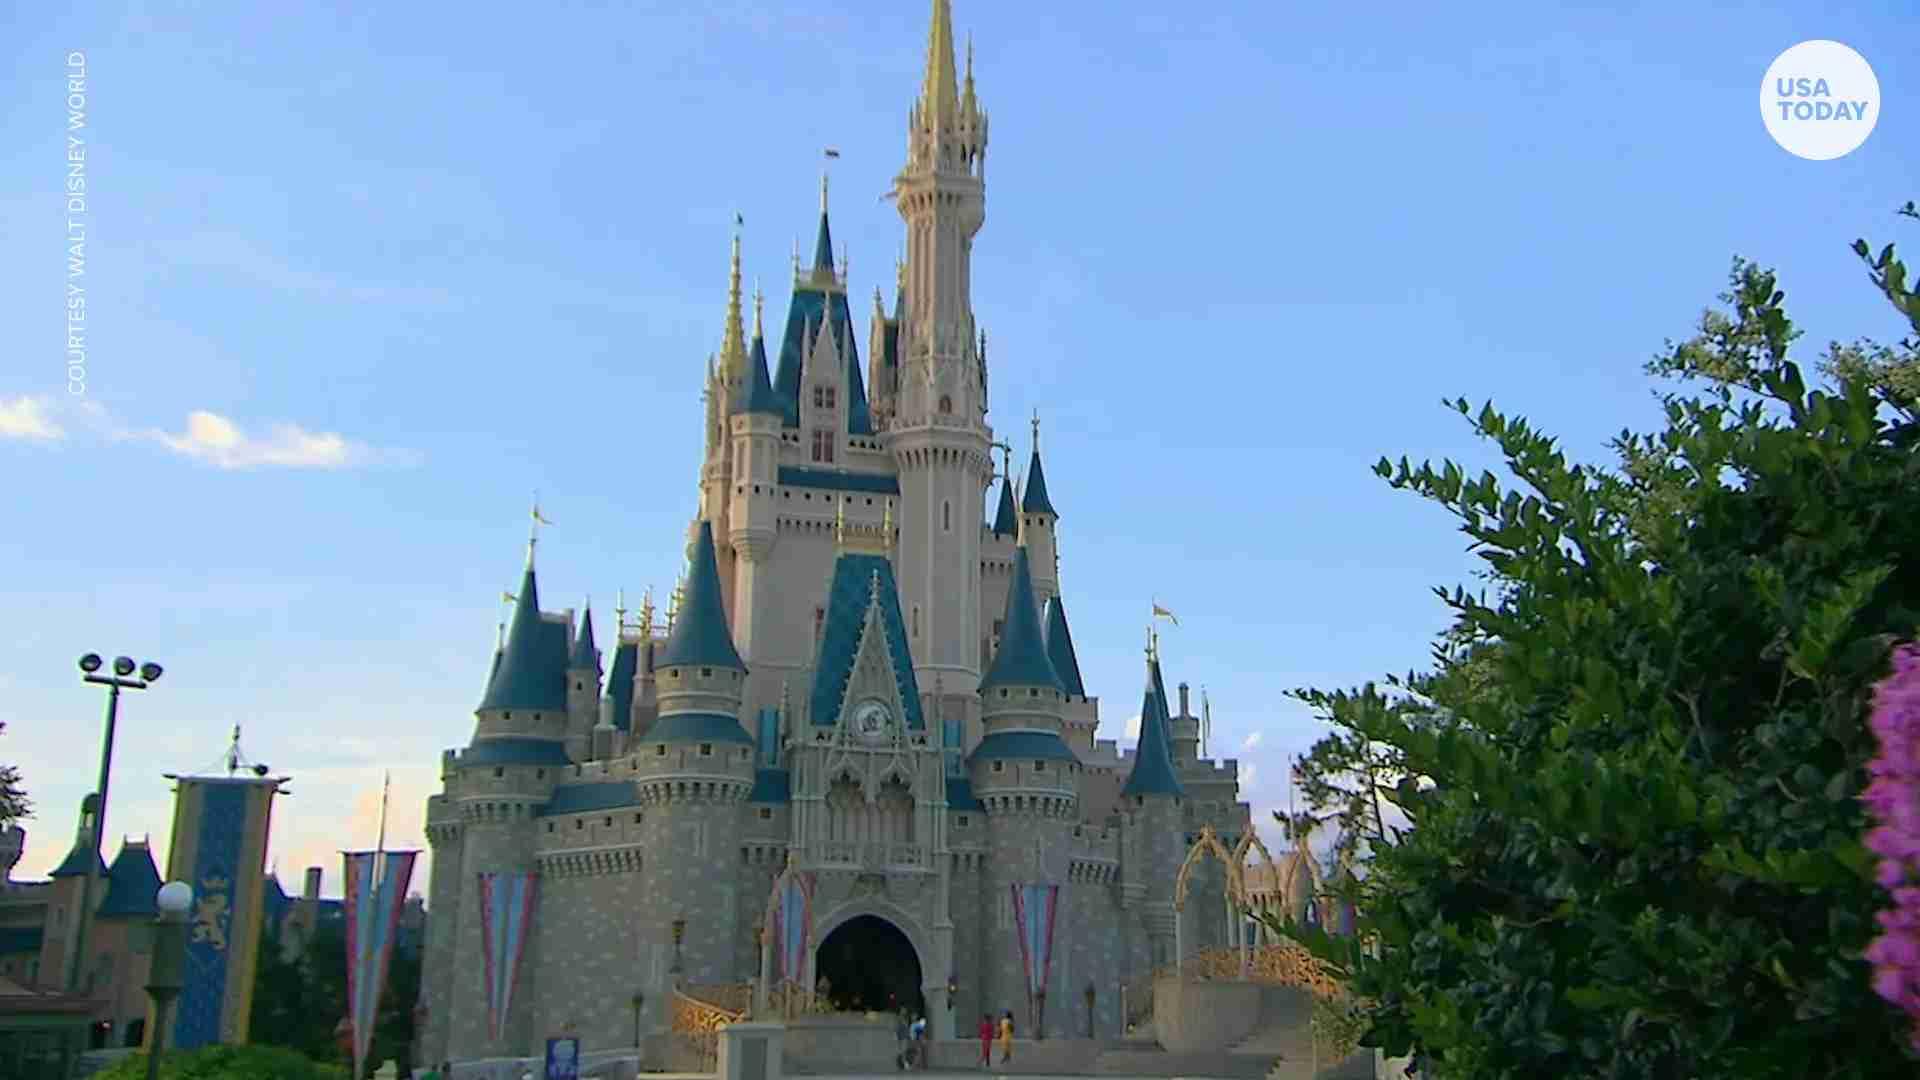 Coronavirus: Disney World, Universal Orlando add hand sanitizer units